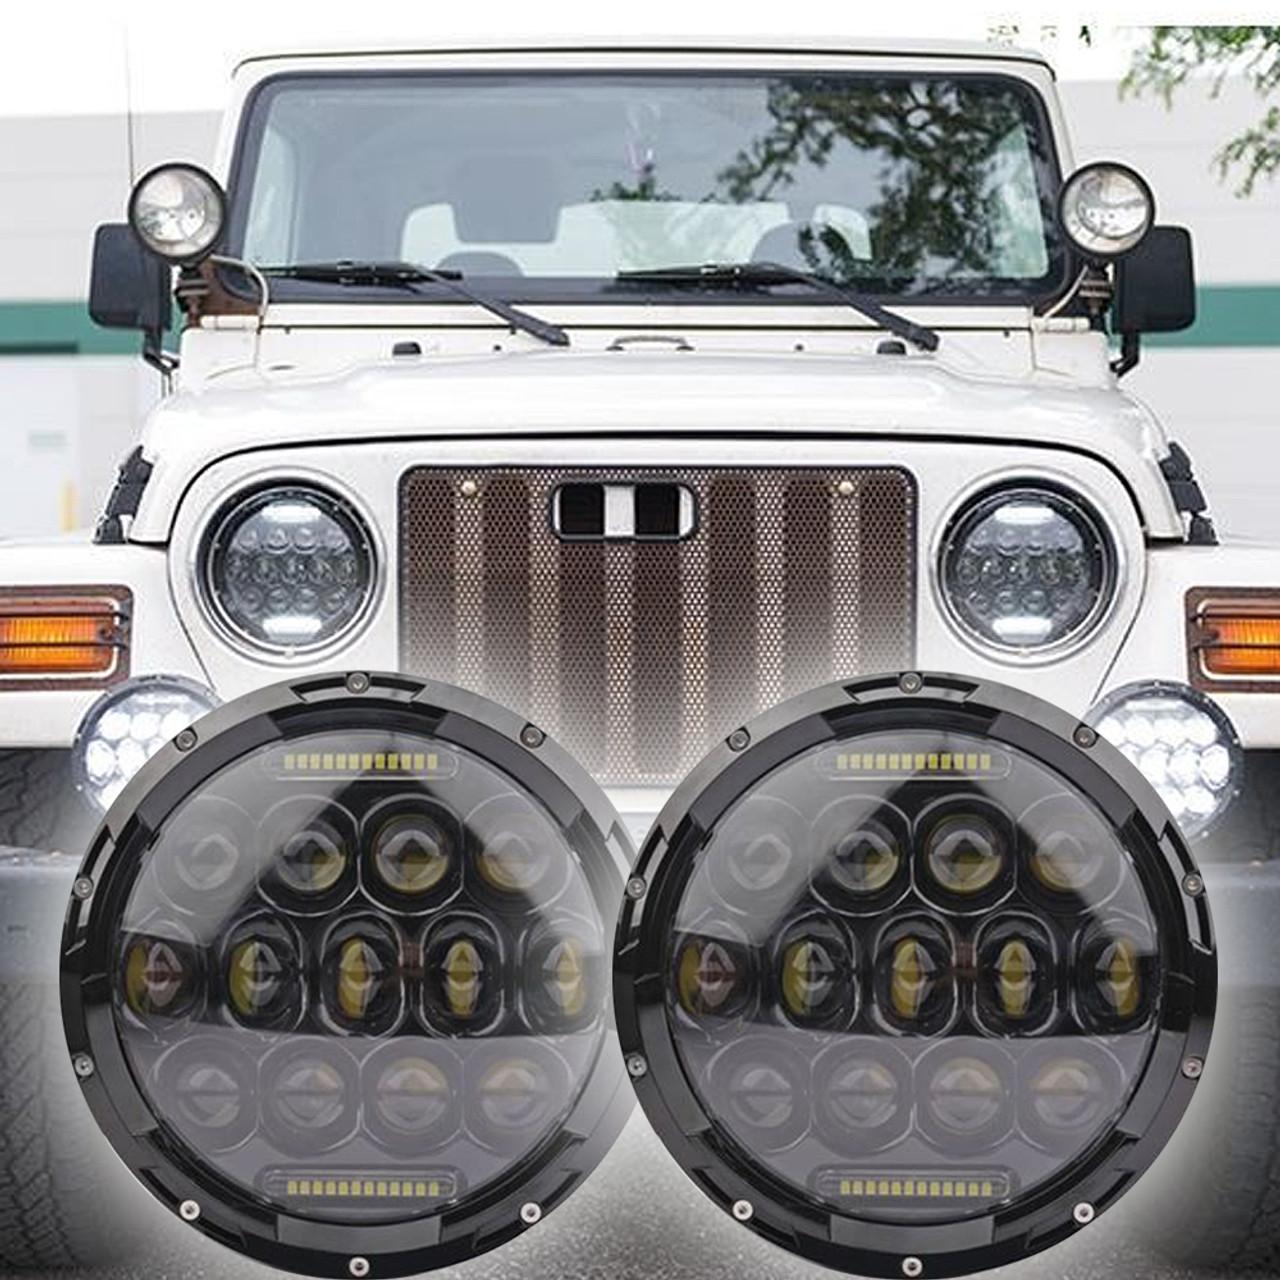 Jeep Wrangler Led Headlights >> 1996 2006 Jeep Wrangler Tj Led Headlight Kit Oracle 75w Black Projector Style